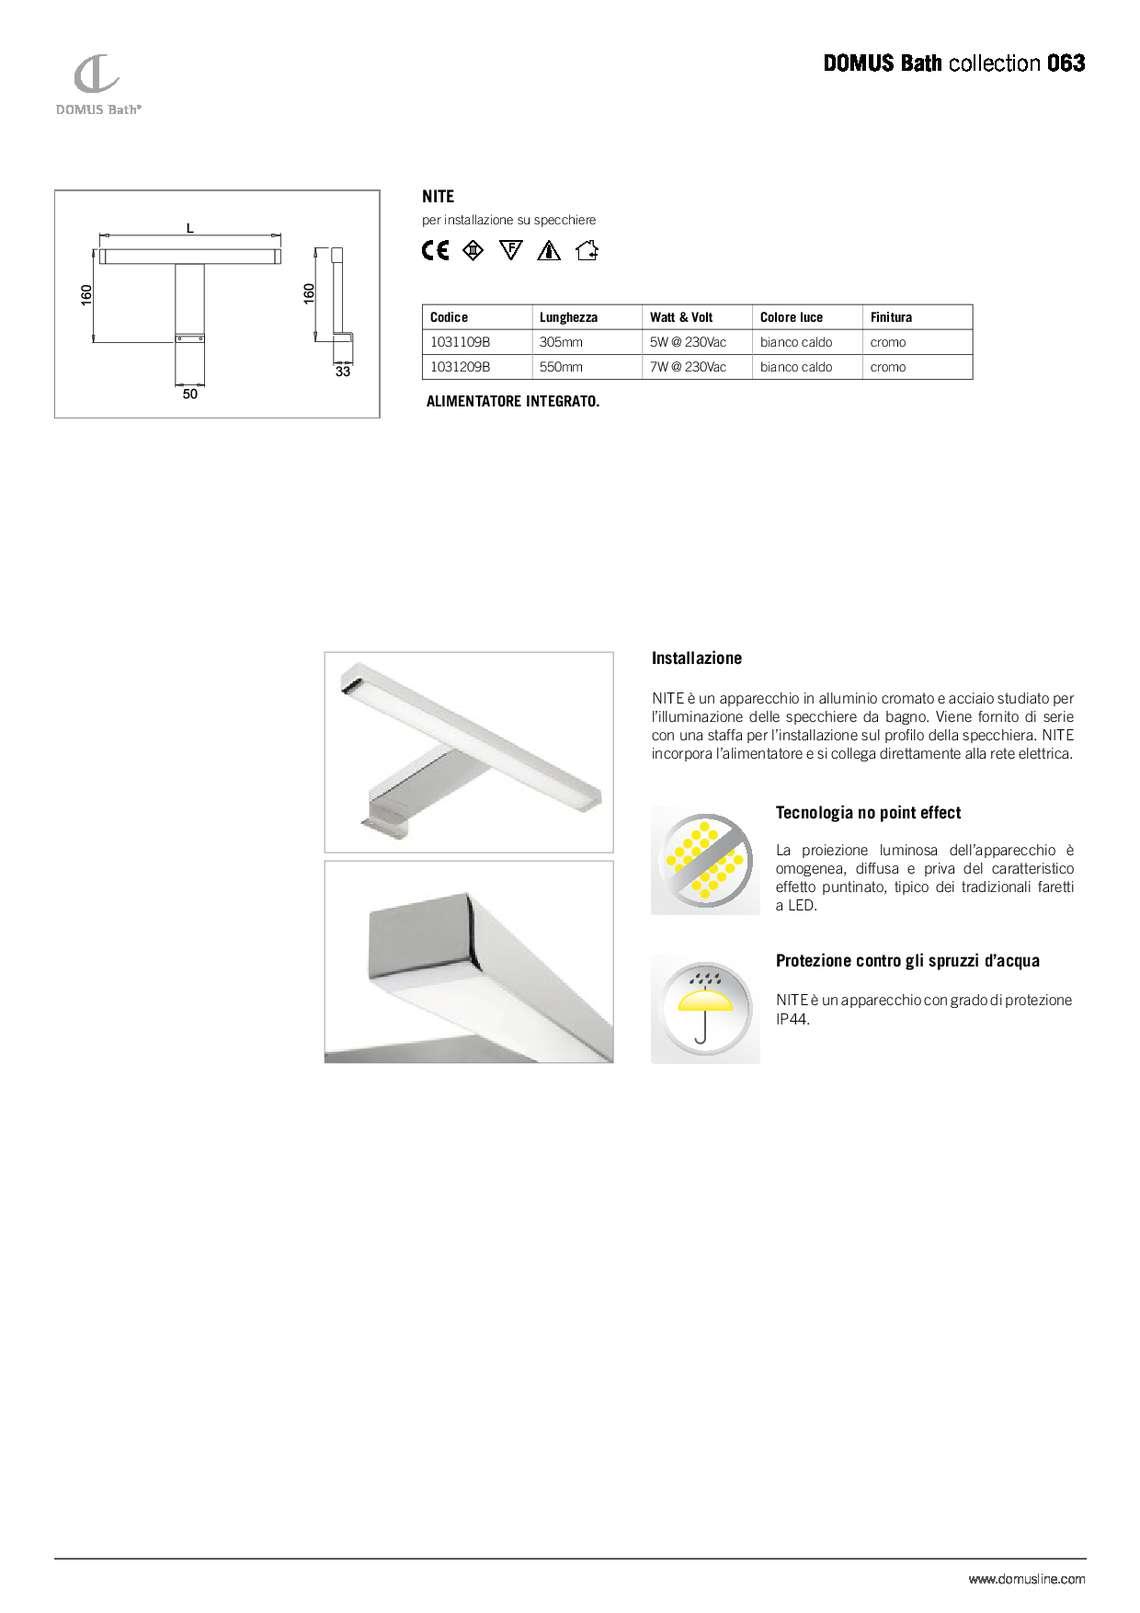 domus-line-illuminazione_26_063.jpg